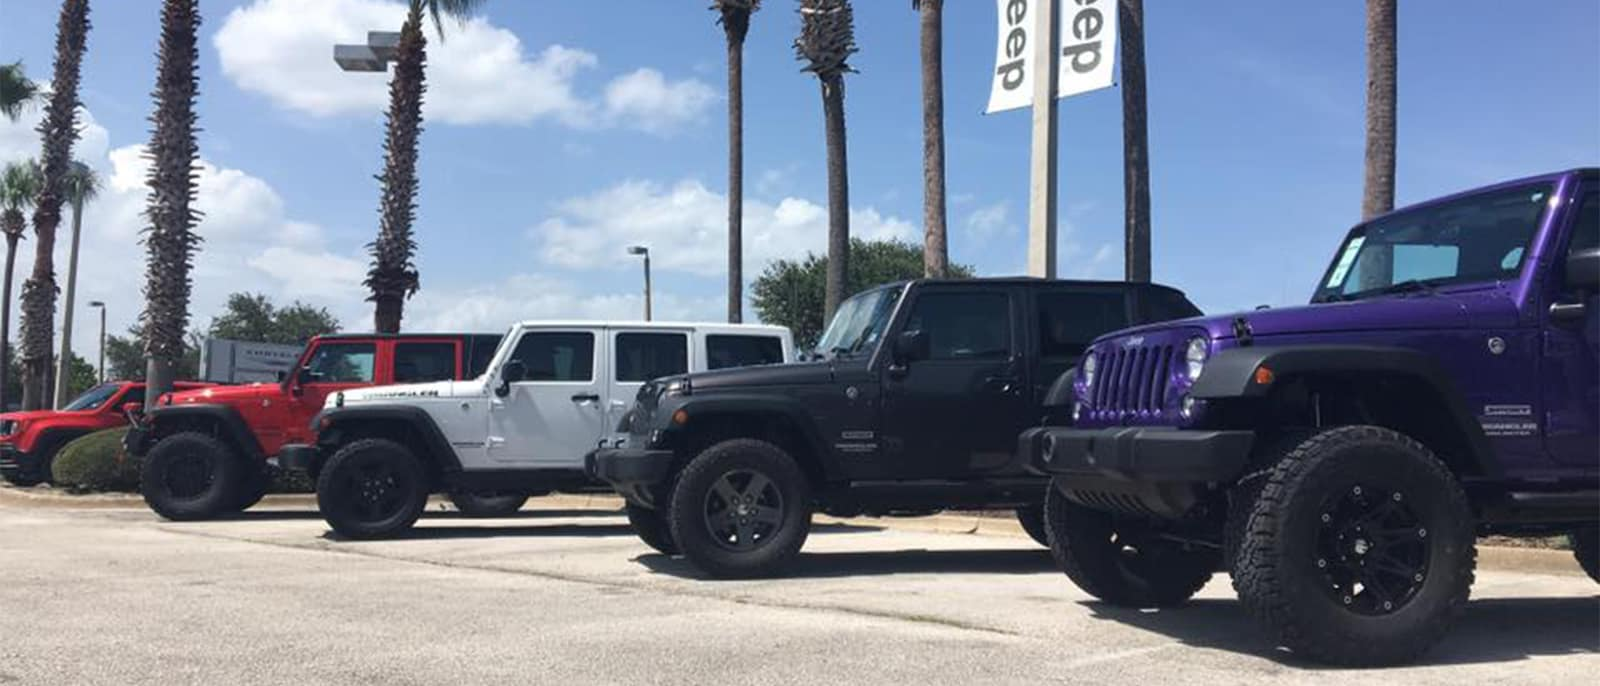 Daytona Garage Jeep Selection